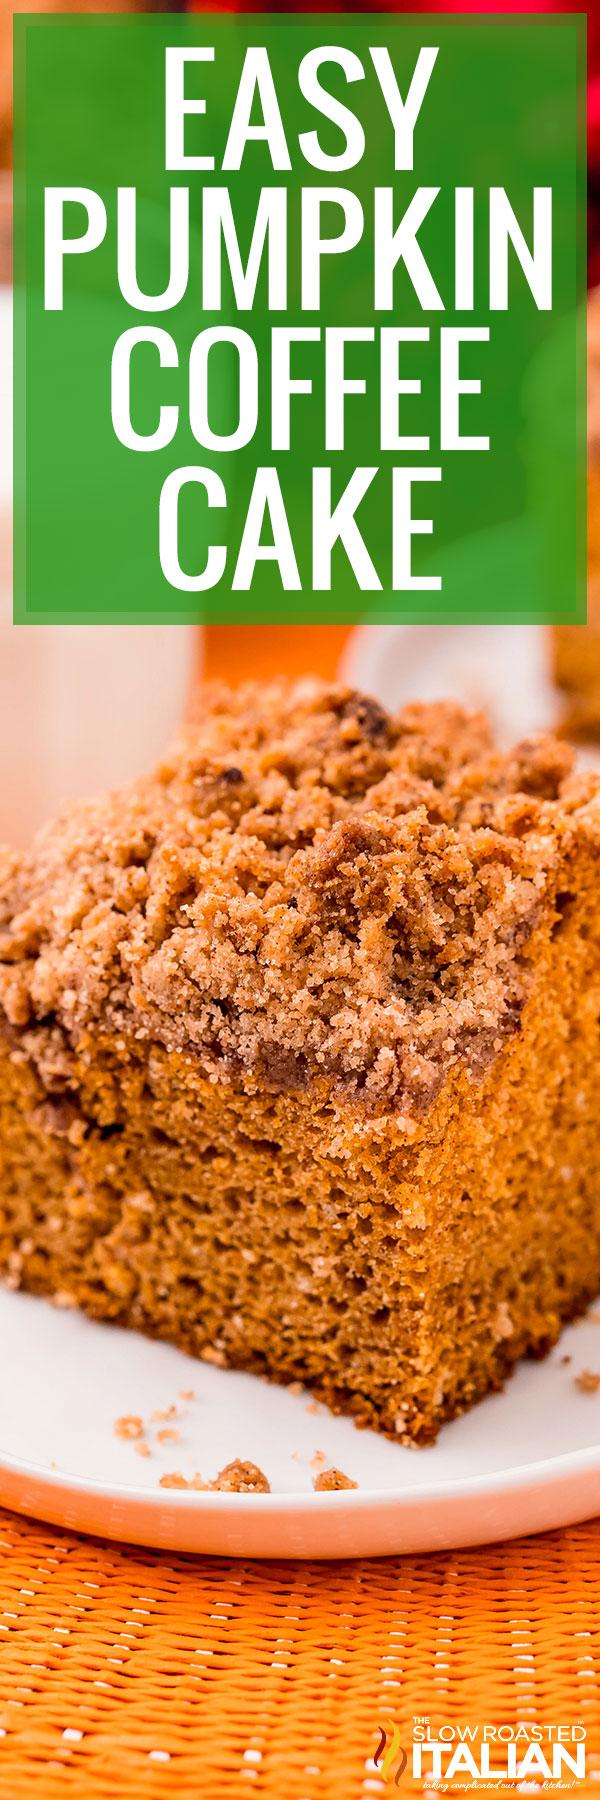 Easy Pumpkin Coffee Cake close up